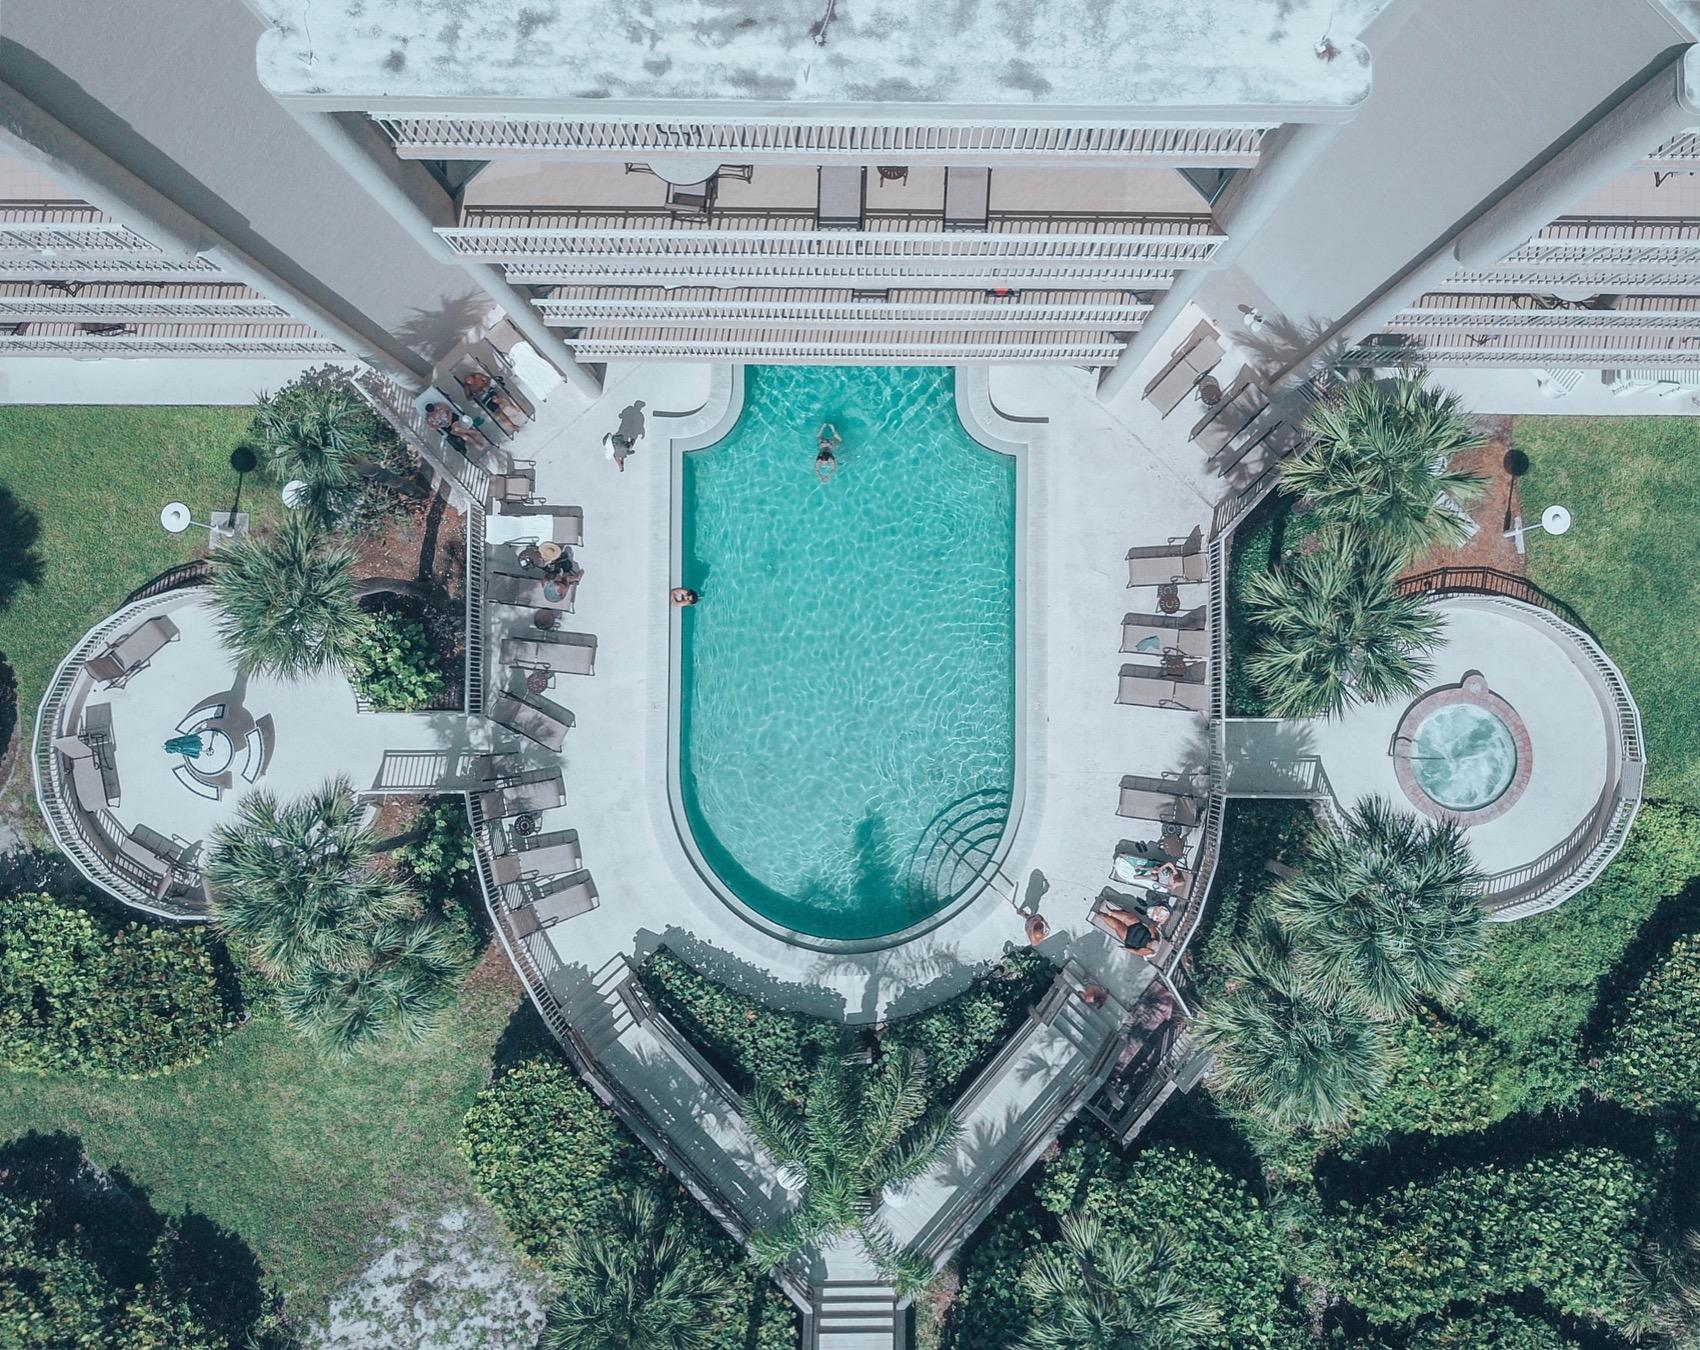 Drone shot of the pool at Veranda Beach Club